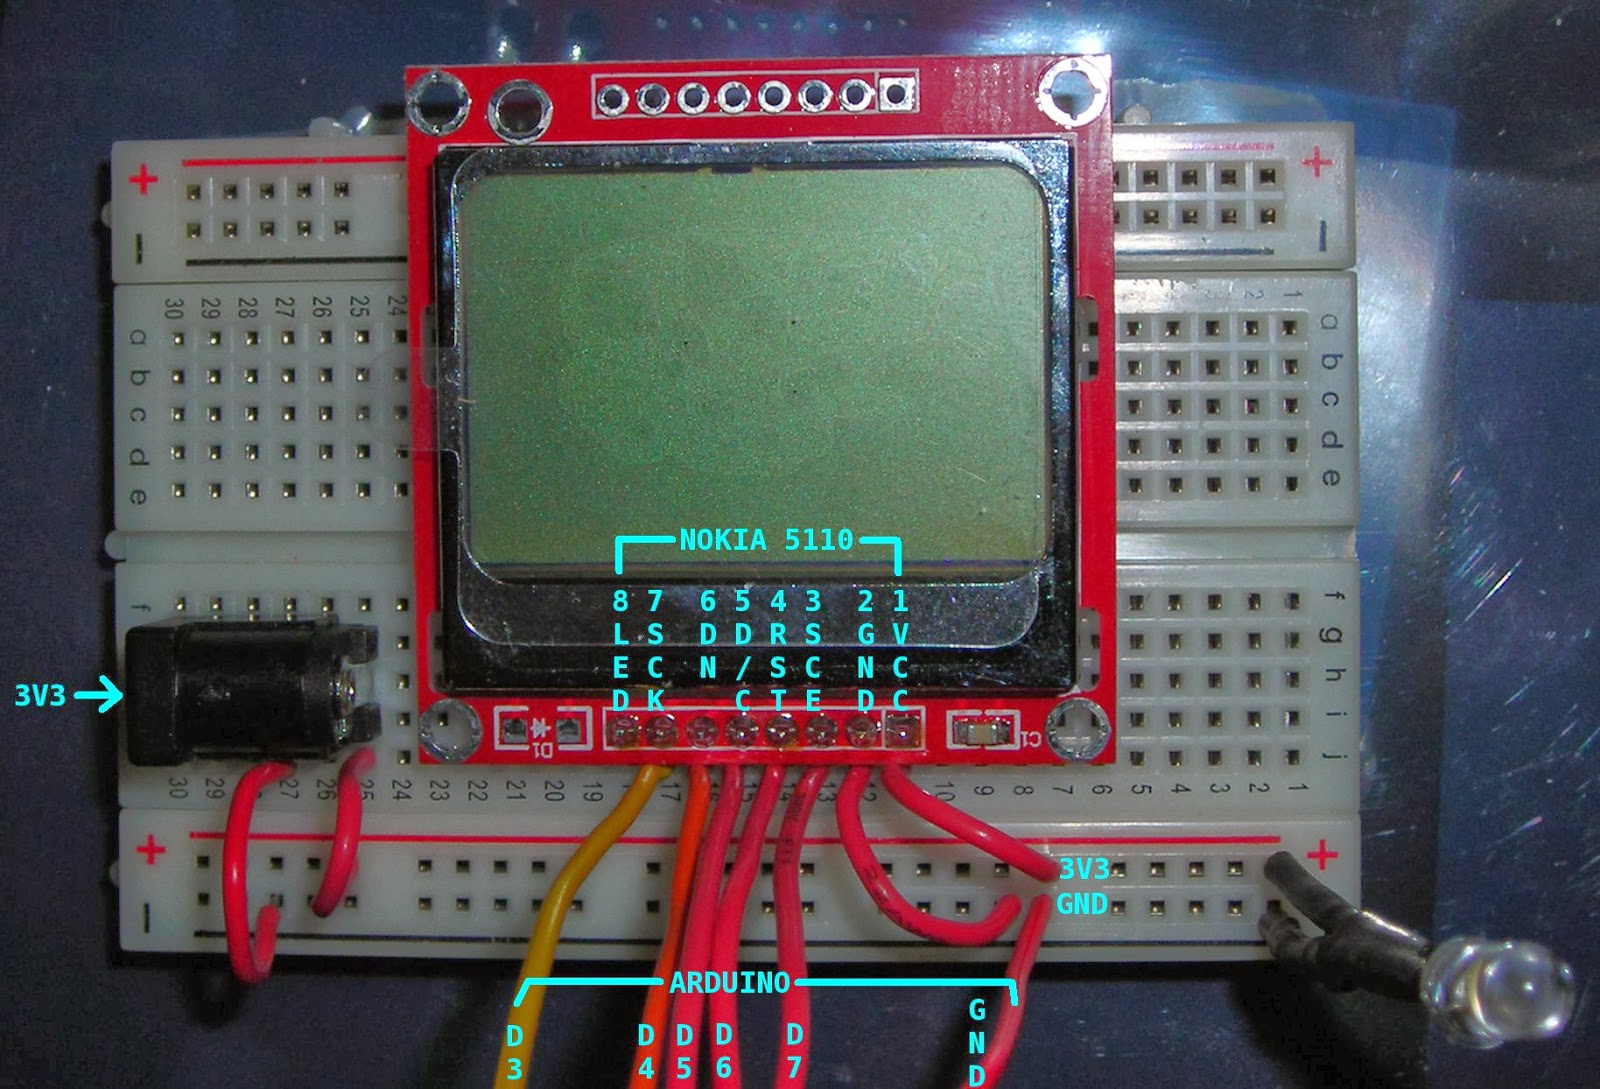 Nokia 5110 Lcd Arduino Wiring Solutions Fritzingrepo Projects D Dtmfdecoderwitharduinodecoderdtmfcom Tidygavtax Pic Circuit